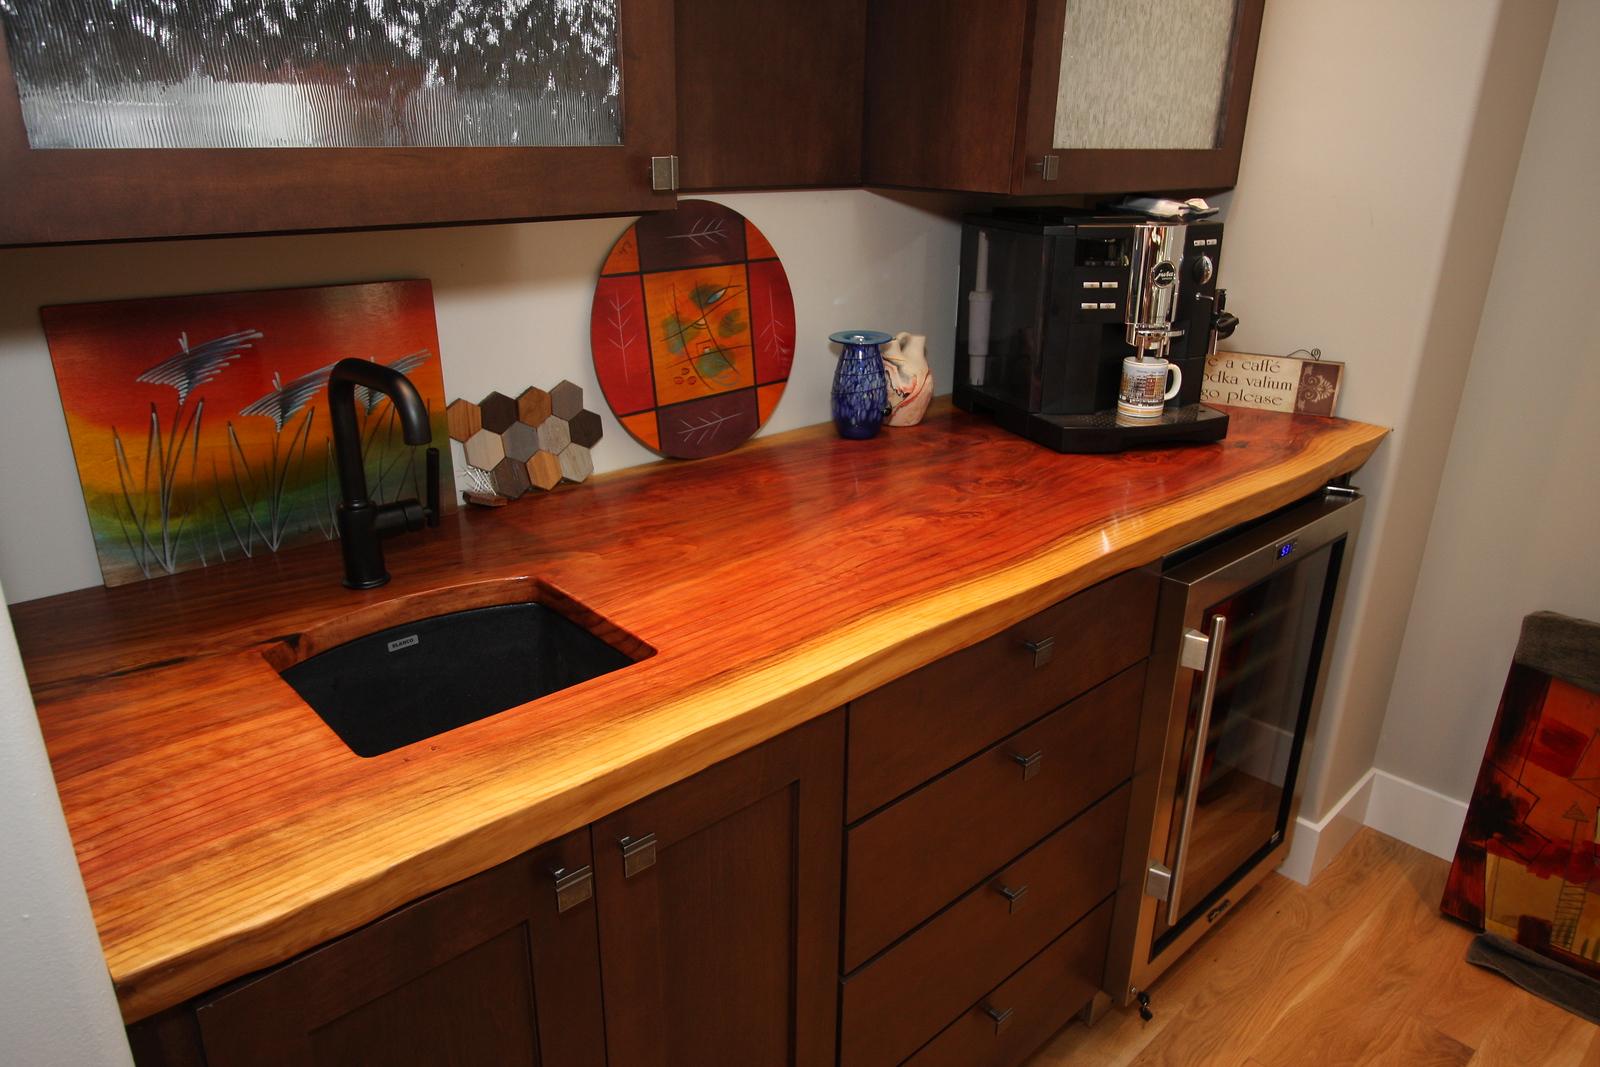 Sequoia, hand rubbed finish, undercut sink